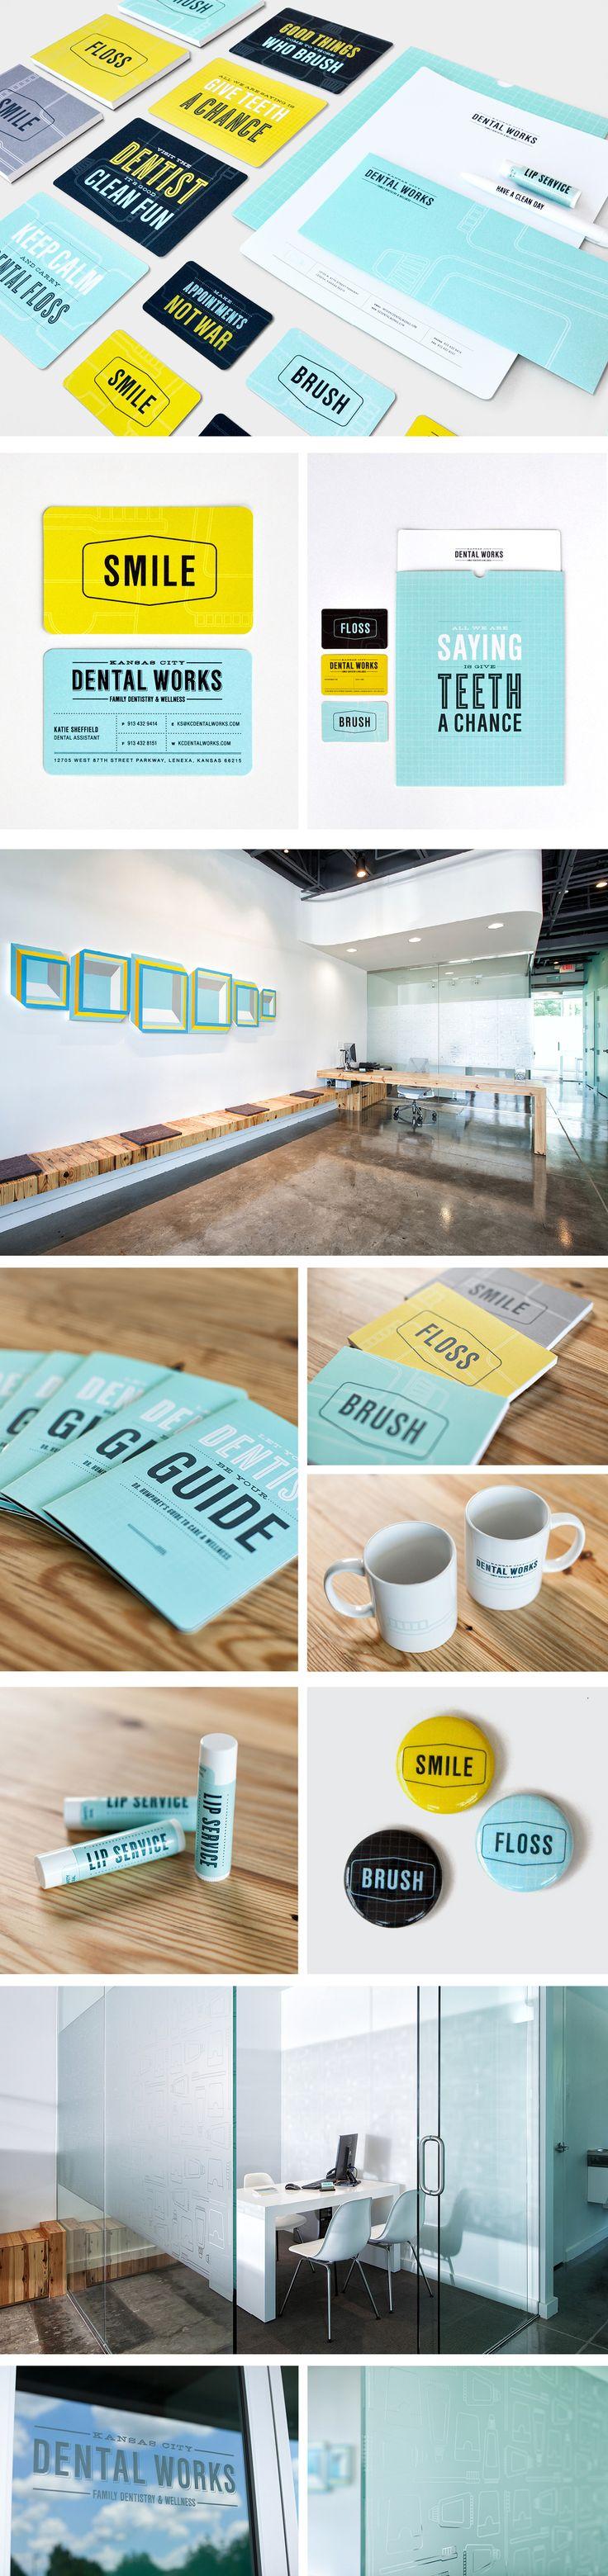 KC Dental Works   Branding Copywriting Design Signage Typography   Design Ranch